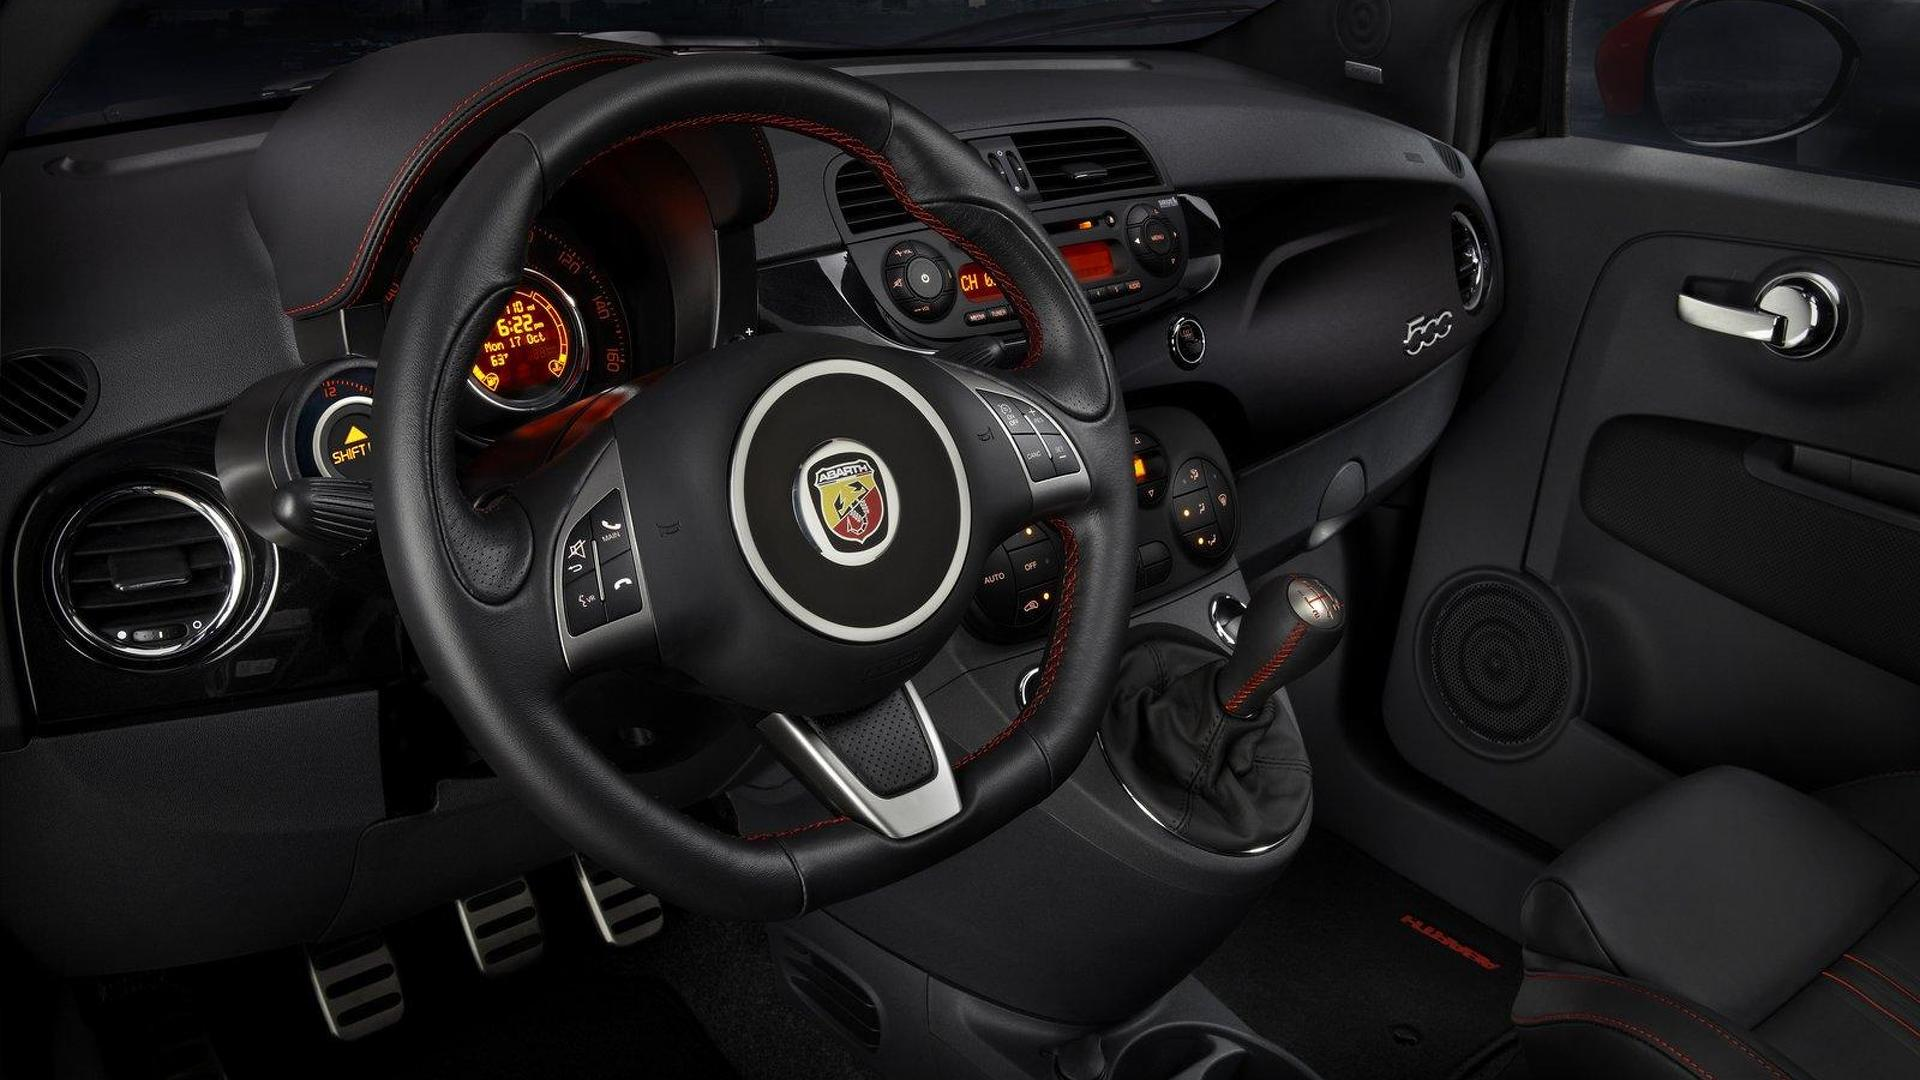 Fiat 500 Abarth to gain an automatic transmission - report Fiat Abarth Specification on fiat abarth custom, fiat abarth gray, original fiat abarth, fiat spider, fiat 500l, fiat 500e, fiat 500c, fiat bravo, fiat cabriolet, fiat seicento, fiat sport, fiat panda, fiat watercraft, fiat scorpion, fiat cooper, fiat punto,